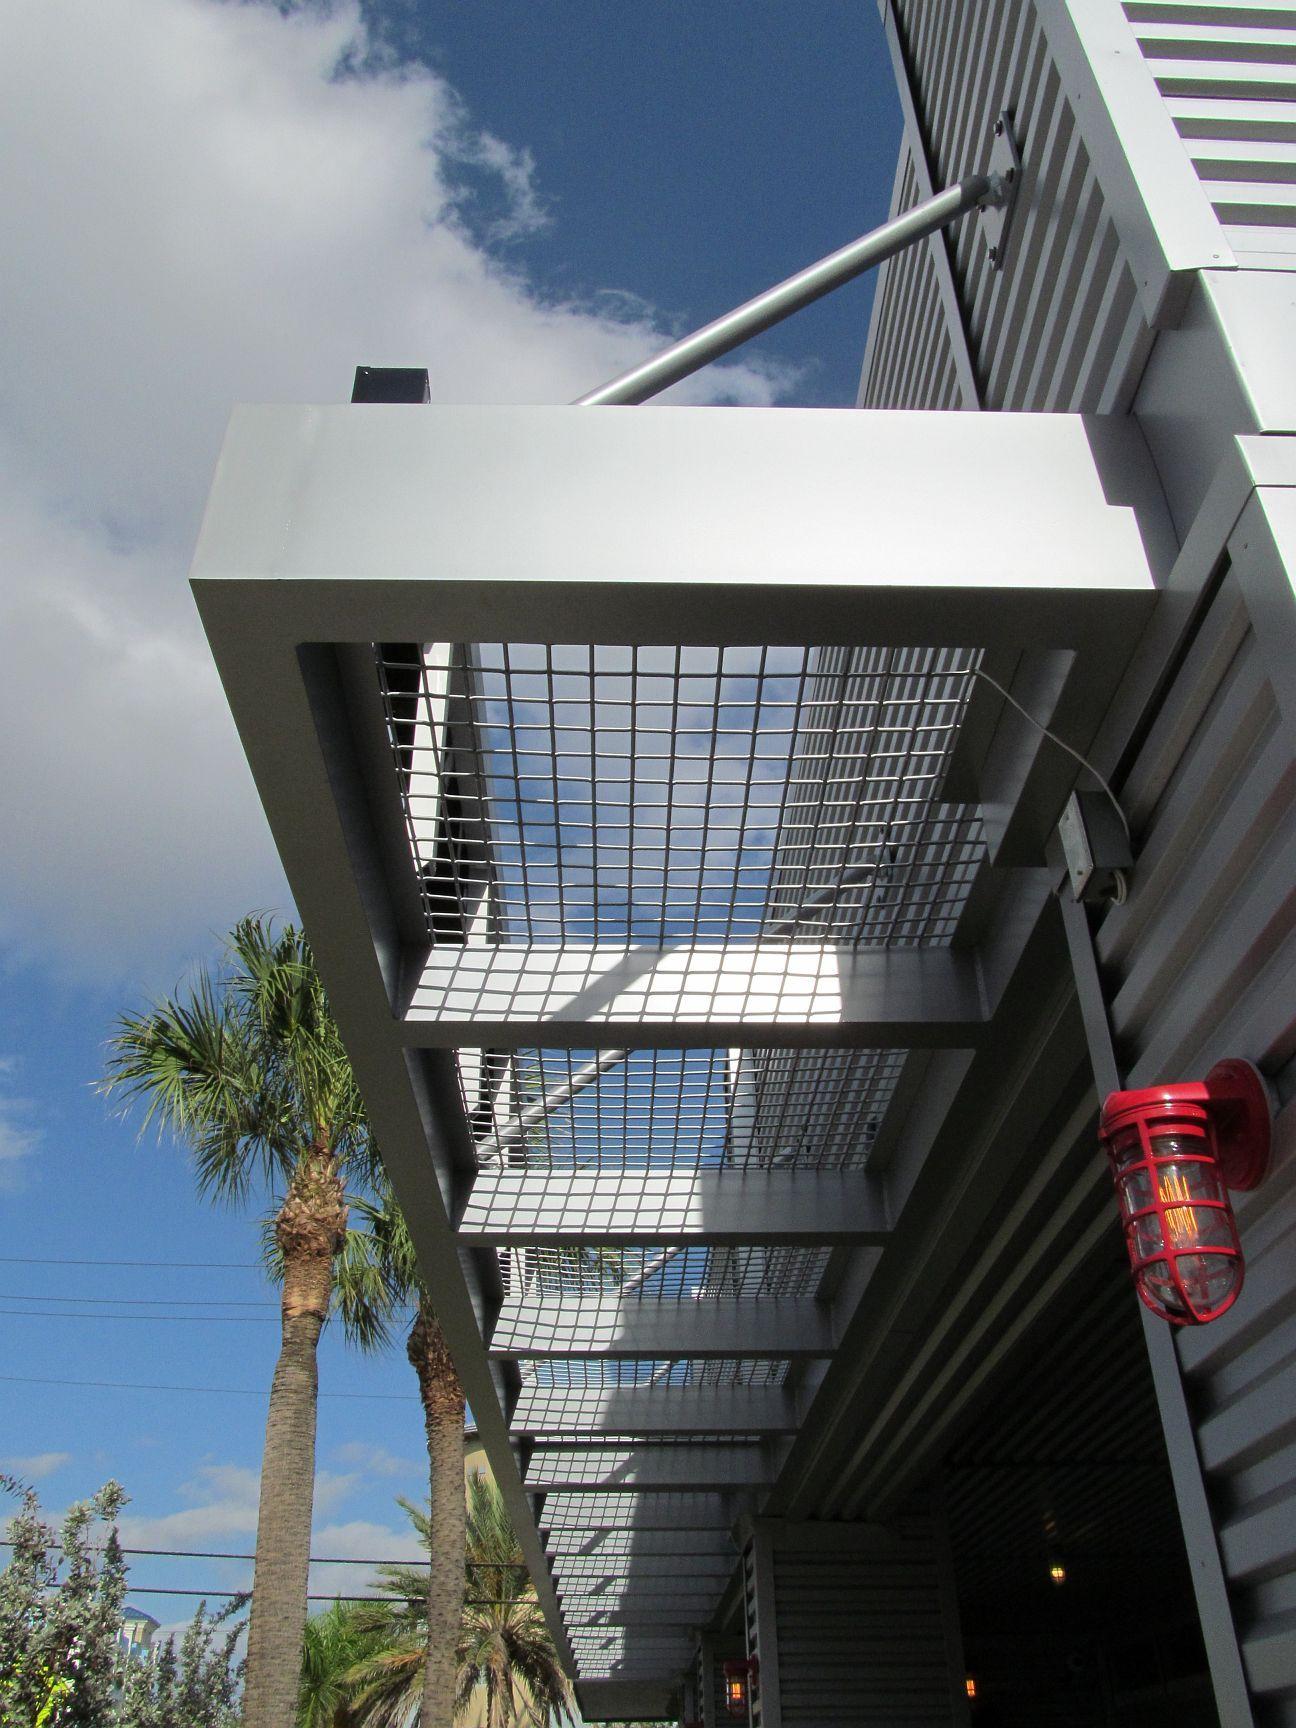 Aegis Metal Canopy Datum Metal Metal Canopy Aluminum Awnings Shade Structure